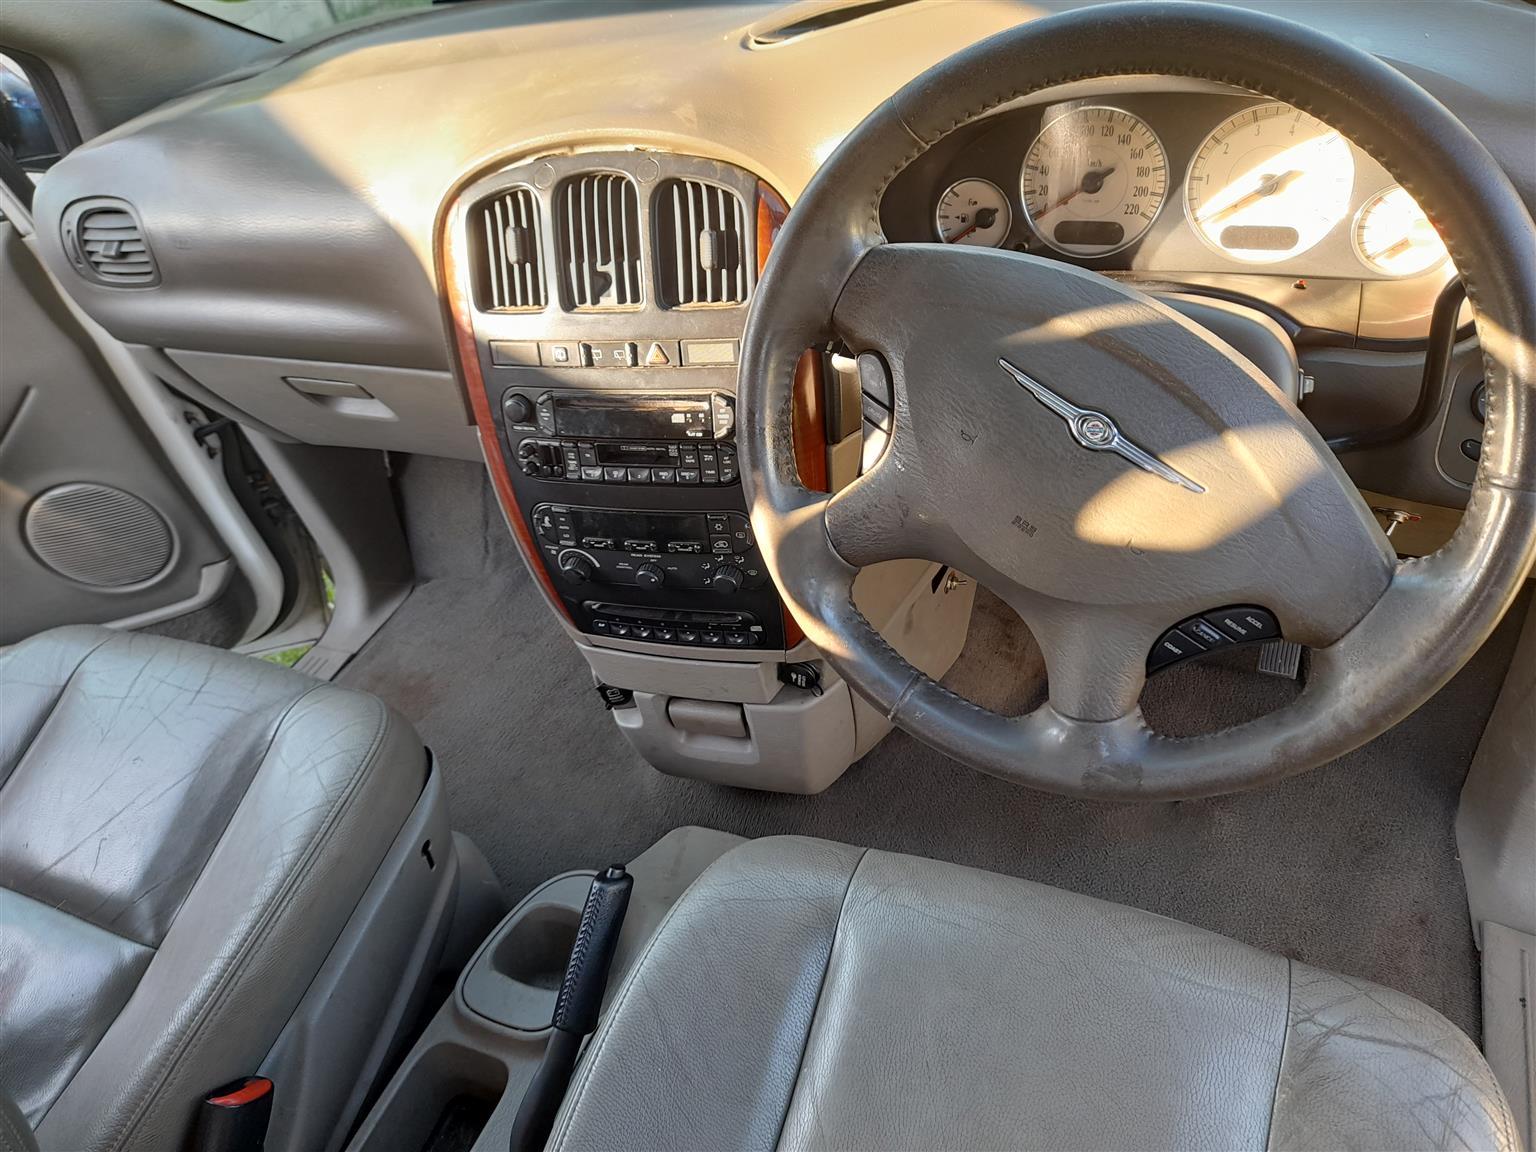 2004 Chrysler Grand Voyager 3.8 Limited